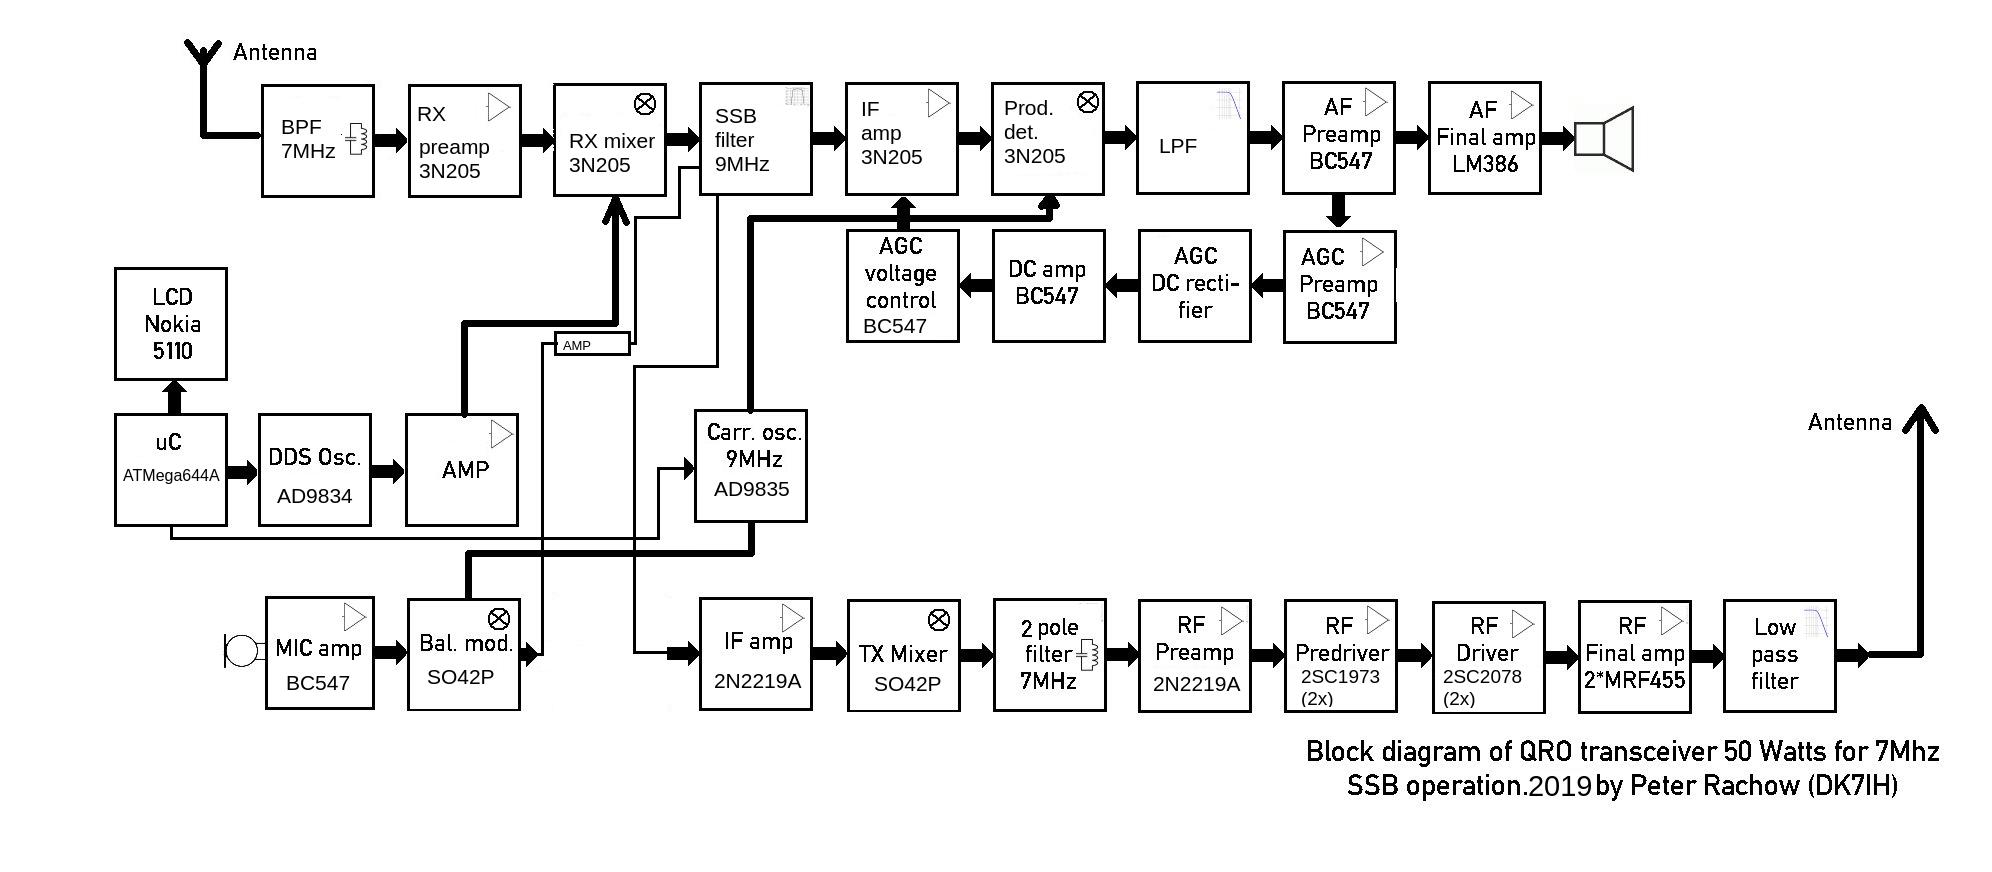 peter rachow amateur radio engineering projects peter rachow dk7ih fig 416 block diagram of ssb transmitter [ 1992 x 872 Pixel ]